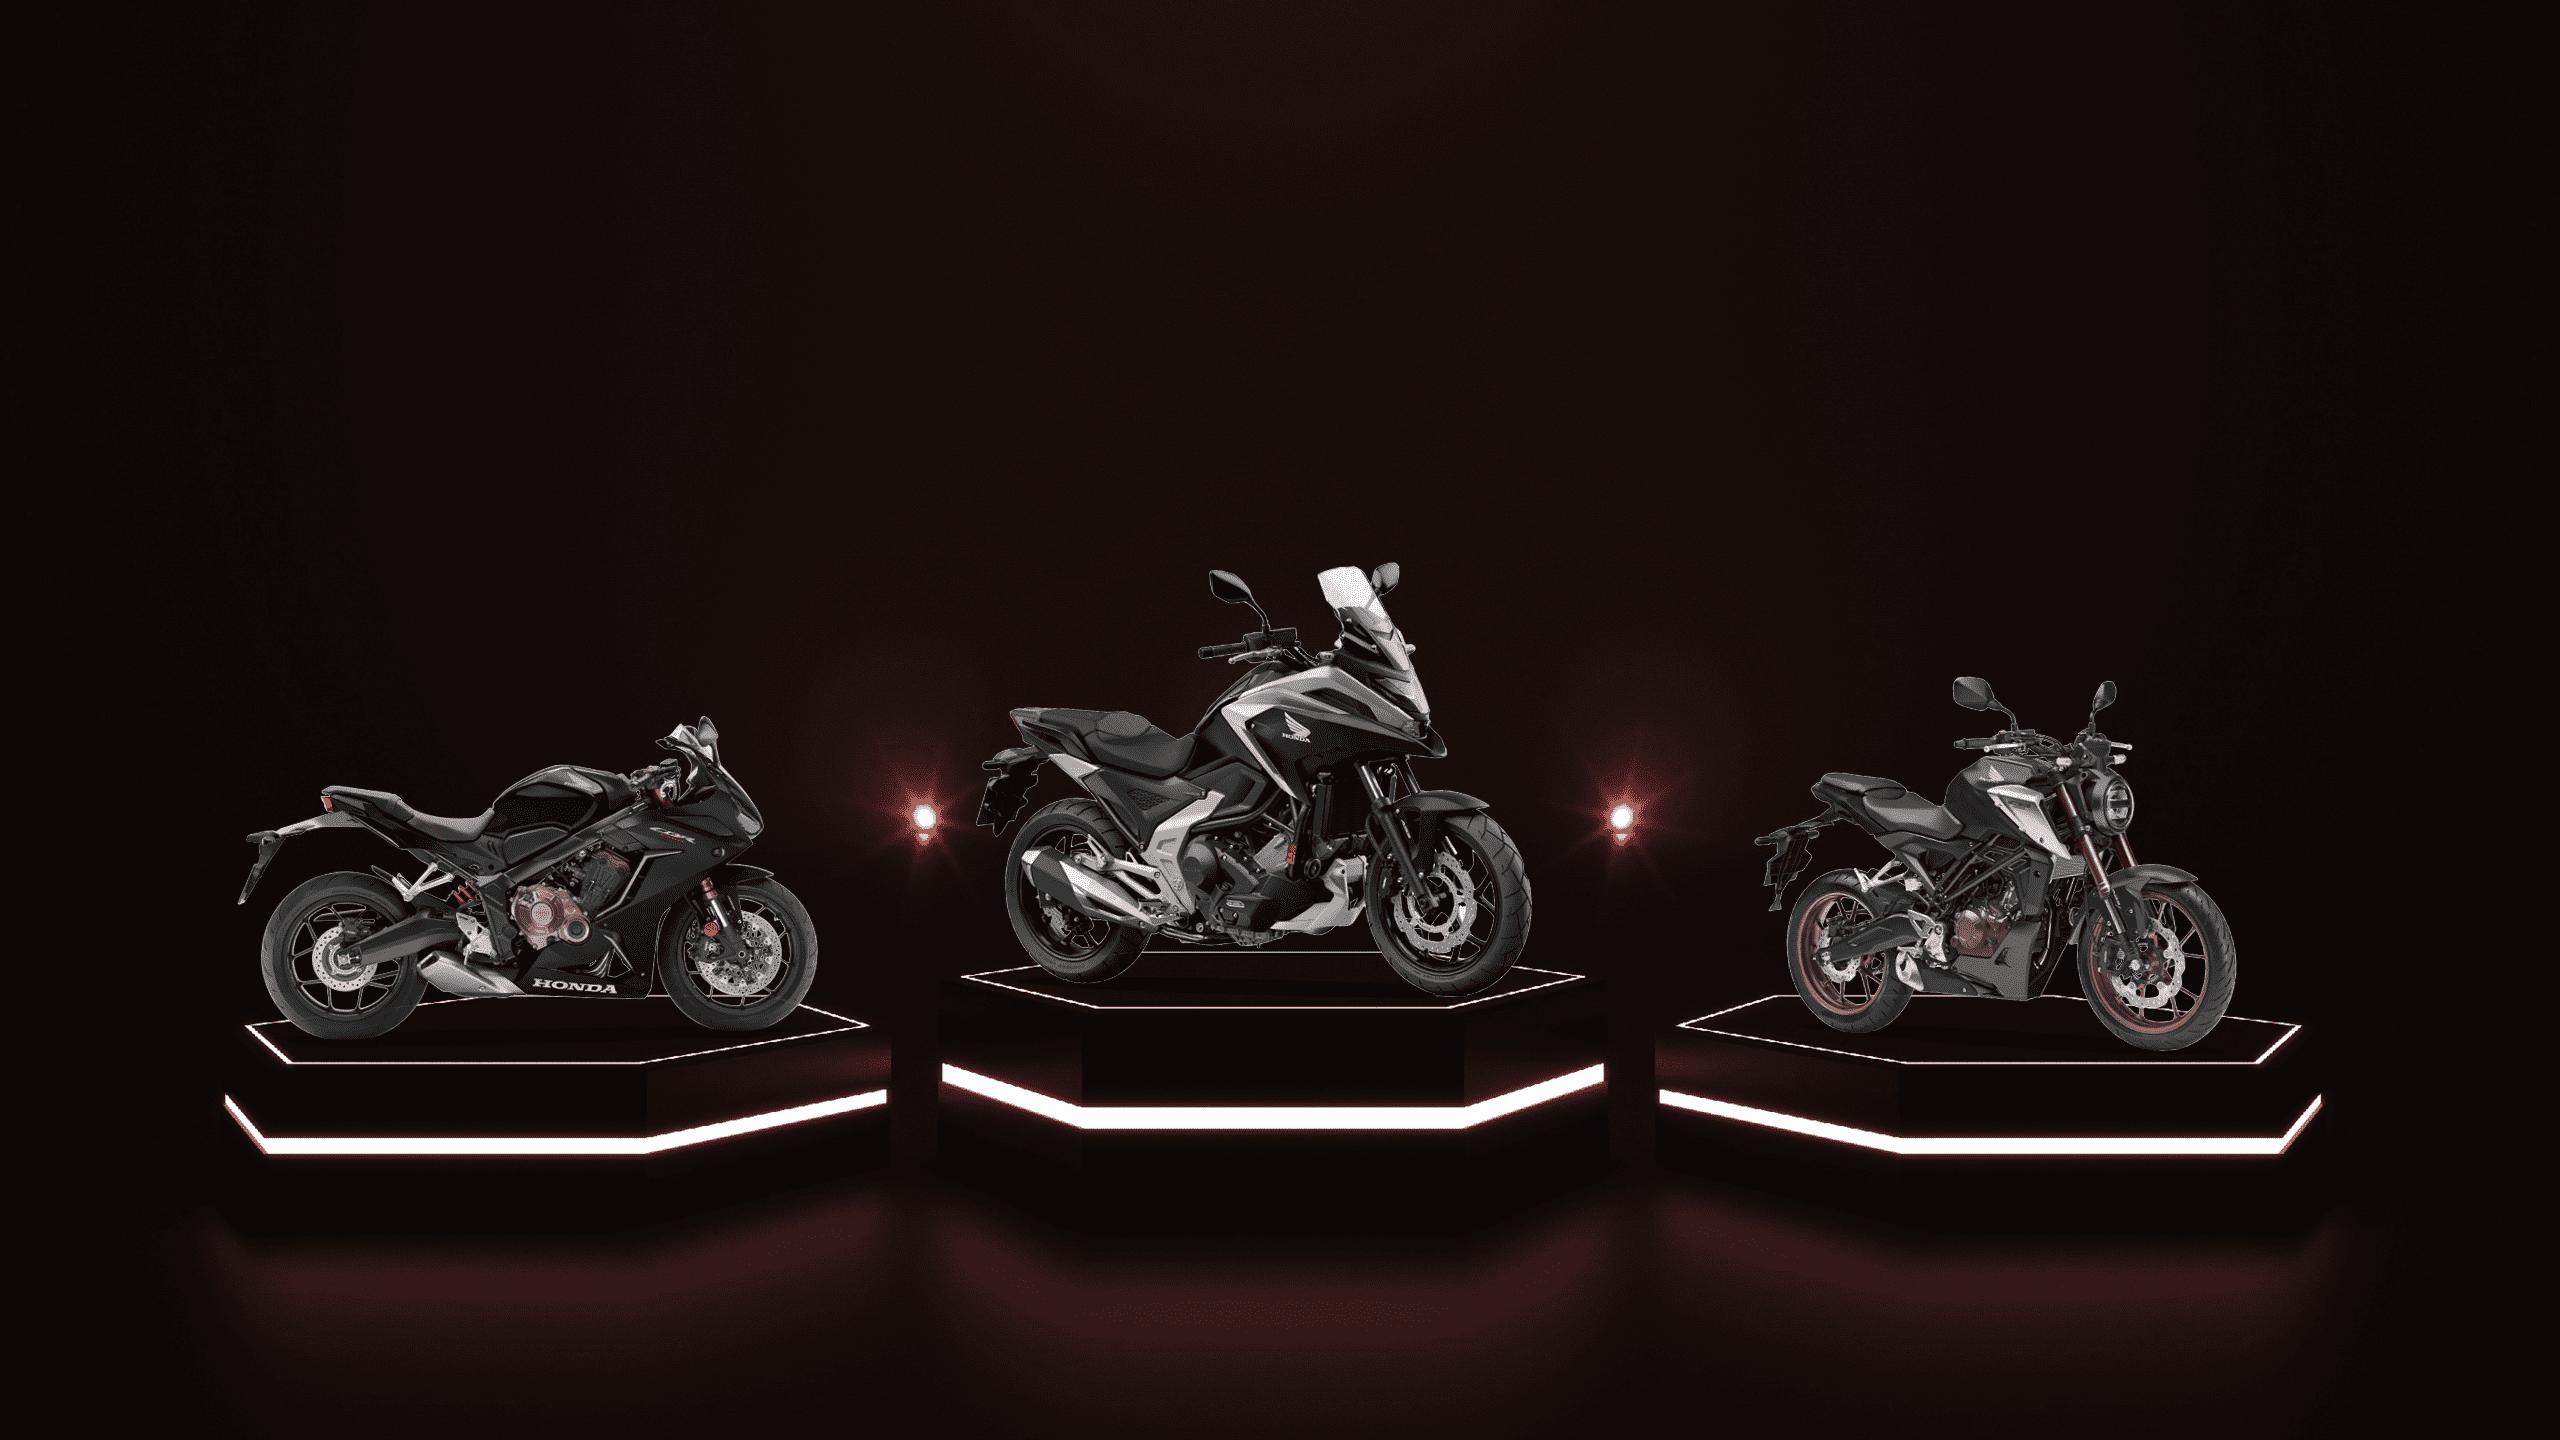 Showtime 2021 Honda MC Norge Motorsykkel